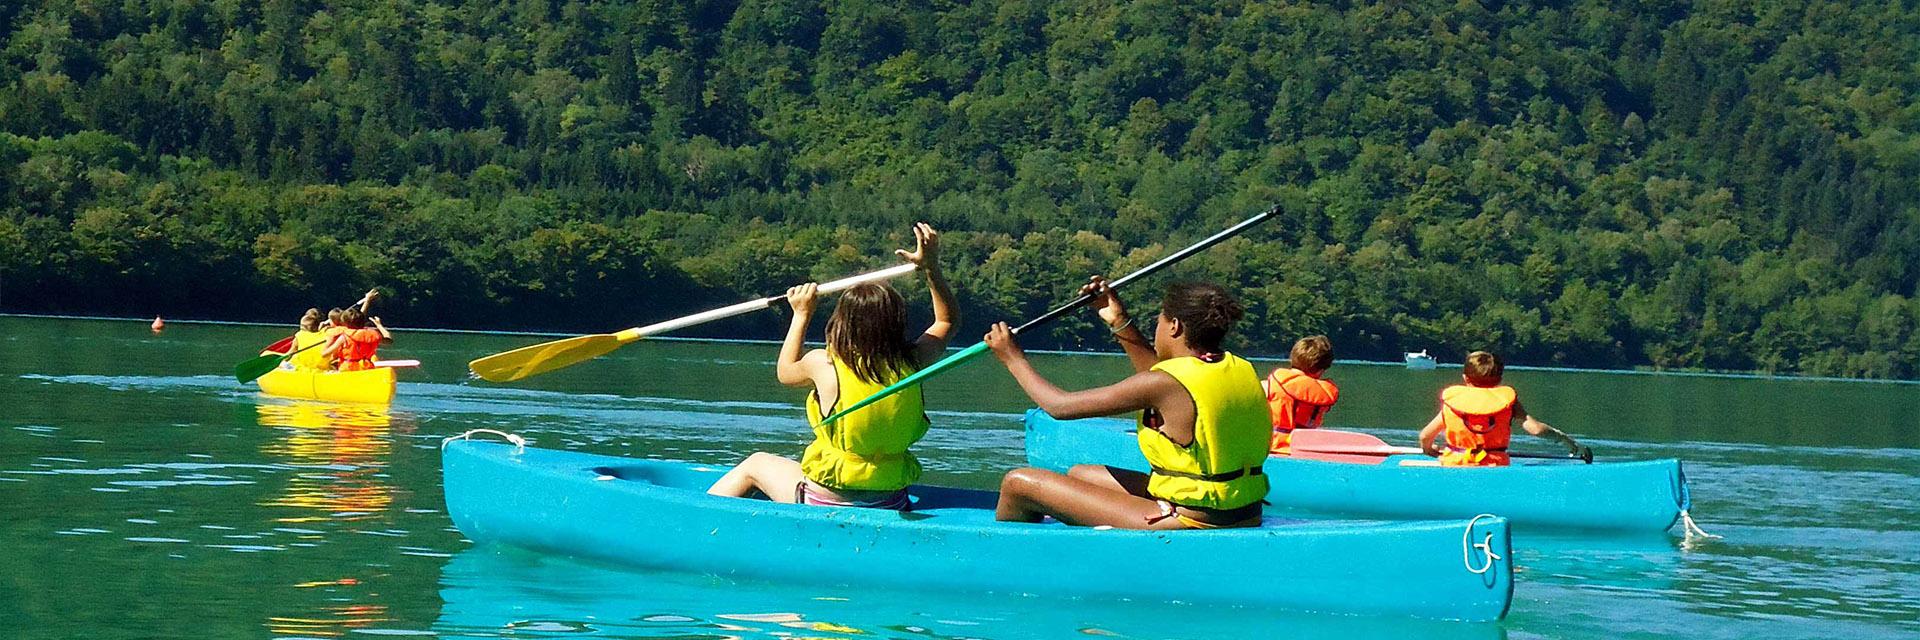 Village_club_vacances_jure-neige-et-plein-air-canoe